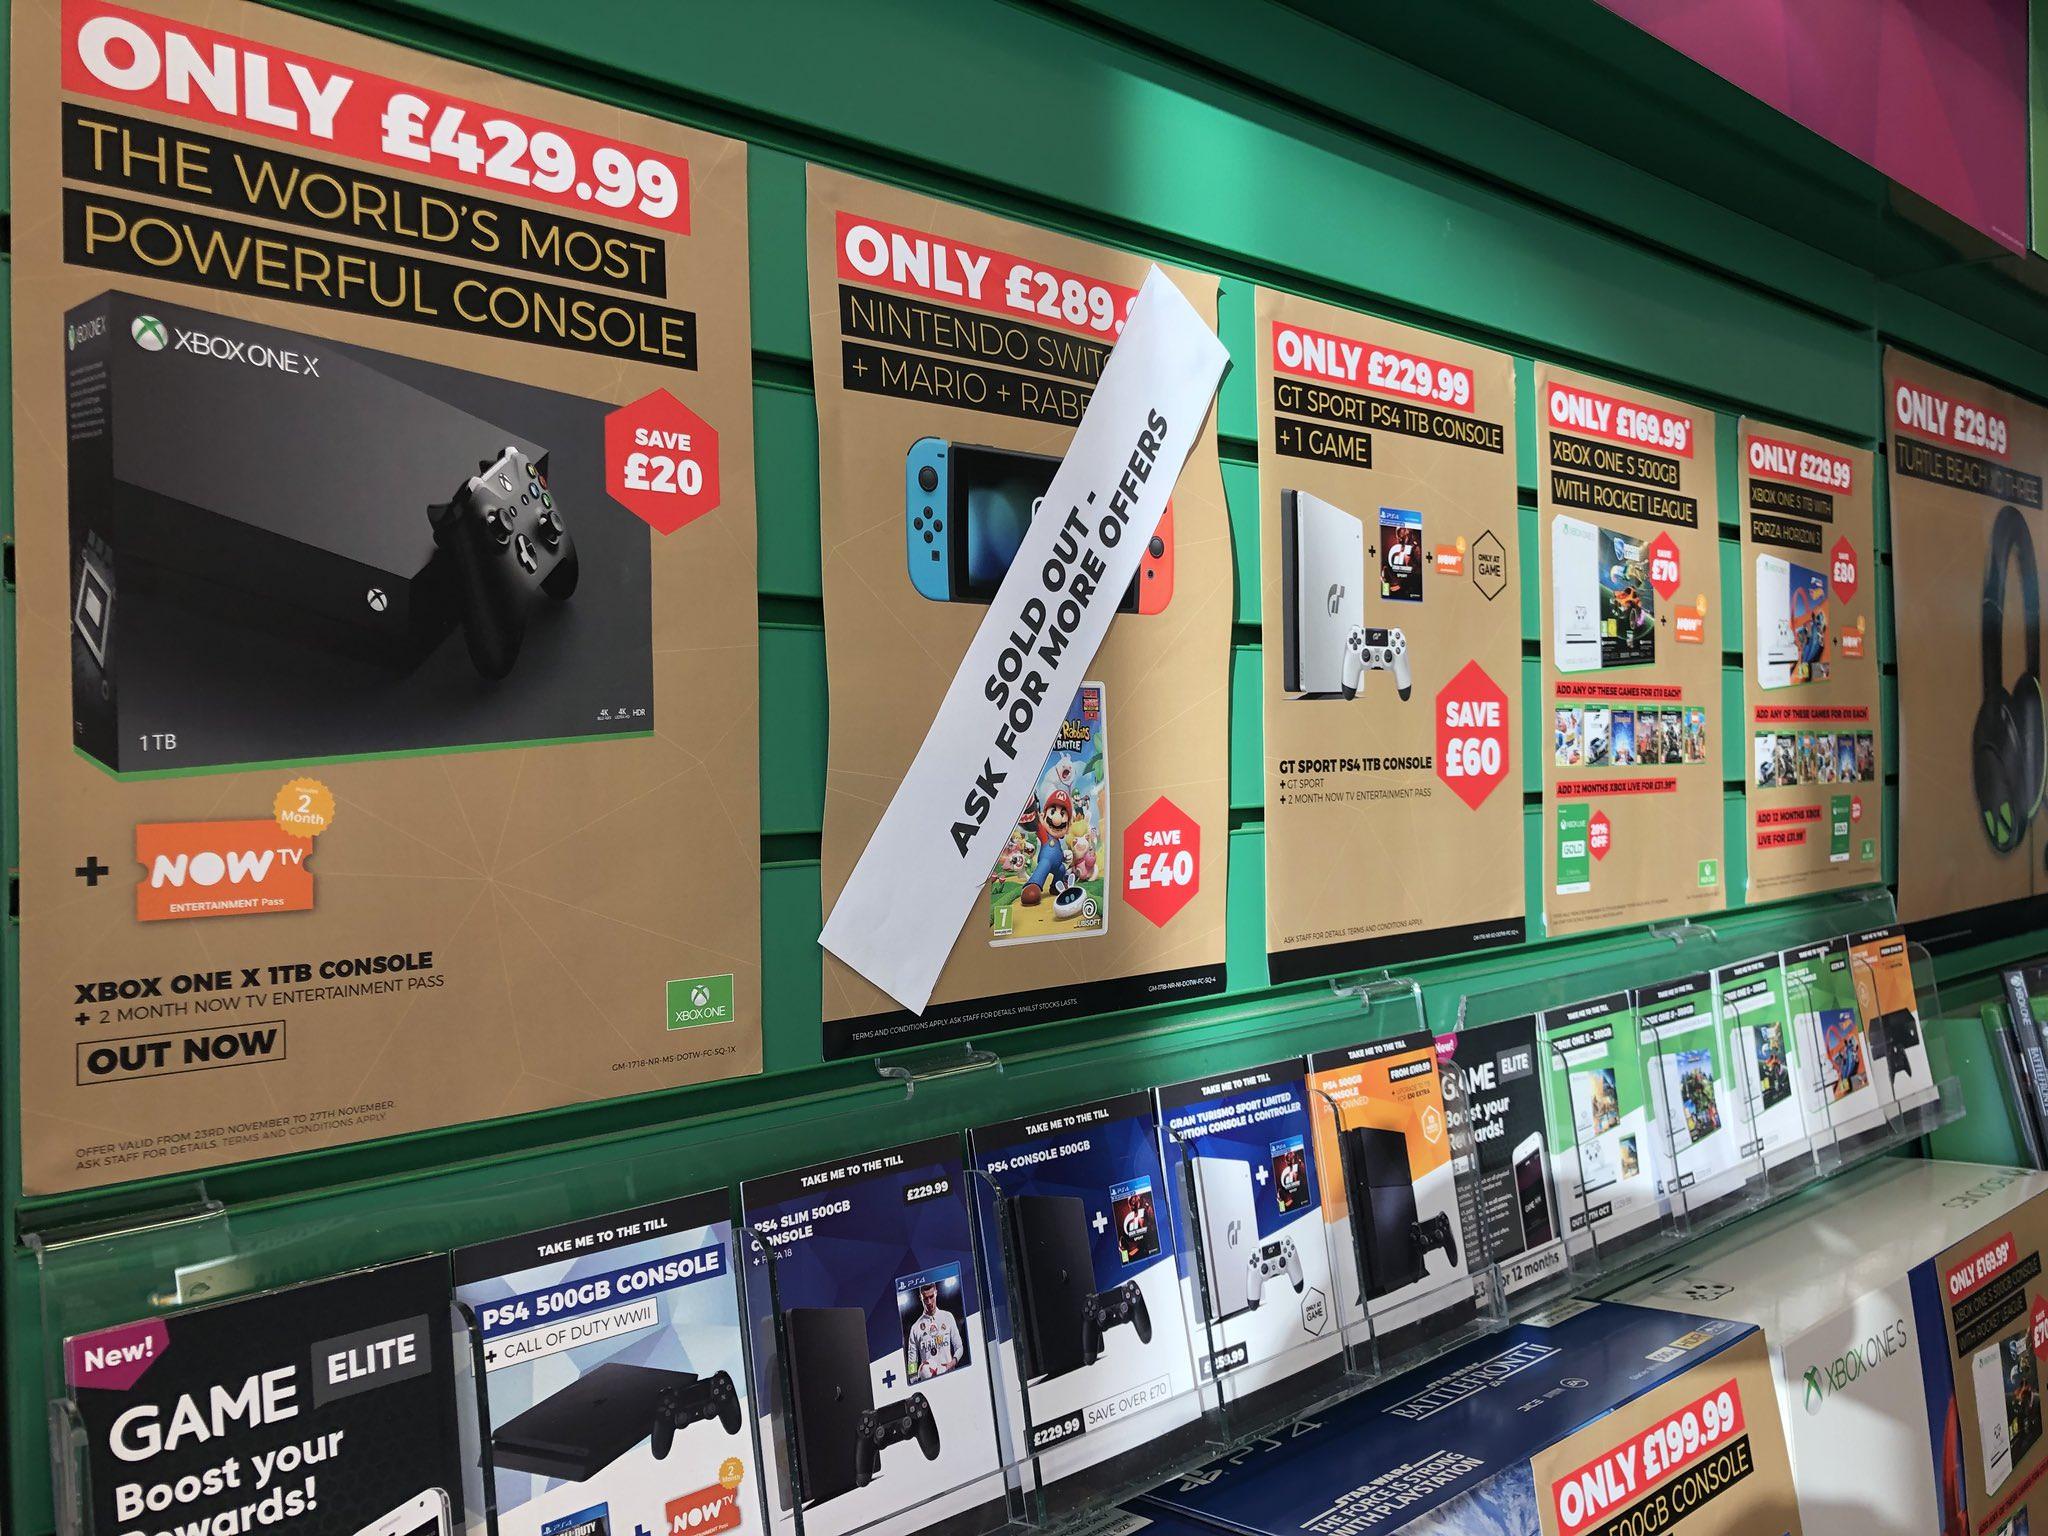 7AugCh9eUrUGk - 【悲報】PS4 尼、ウォルマート、Best Buy、GameStopアメリカ主要小売店全てで売り切れてしまうw